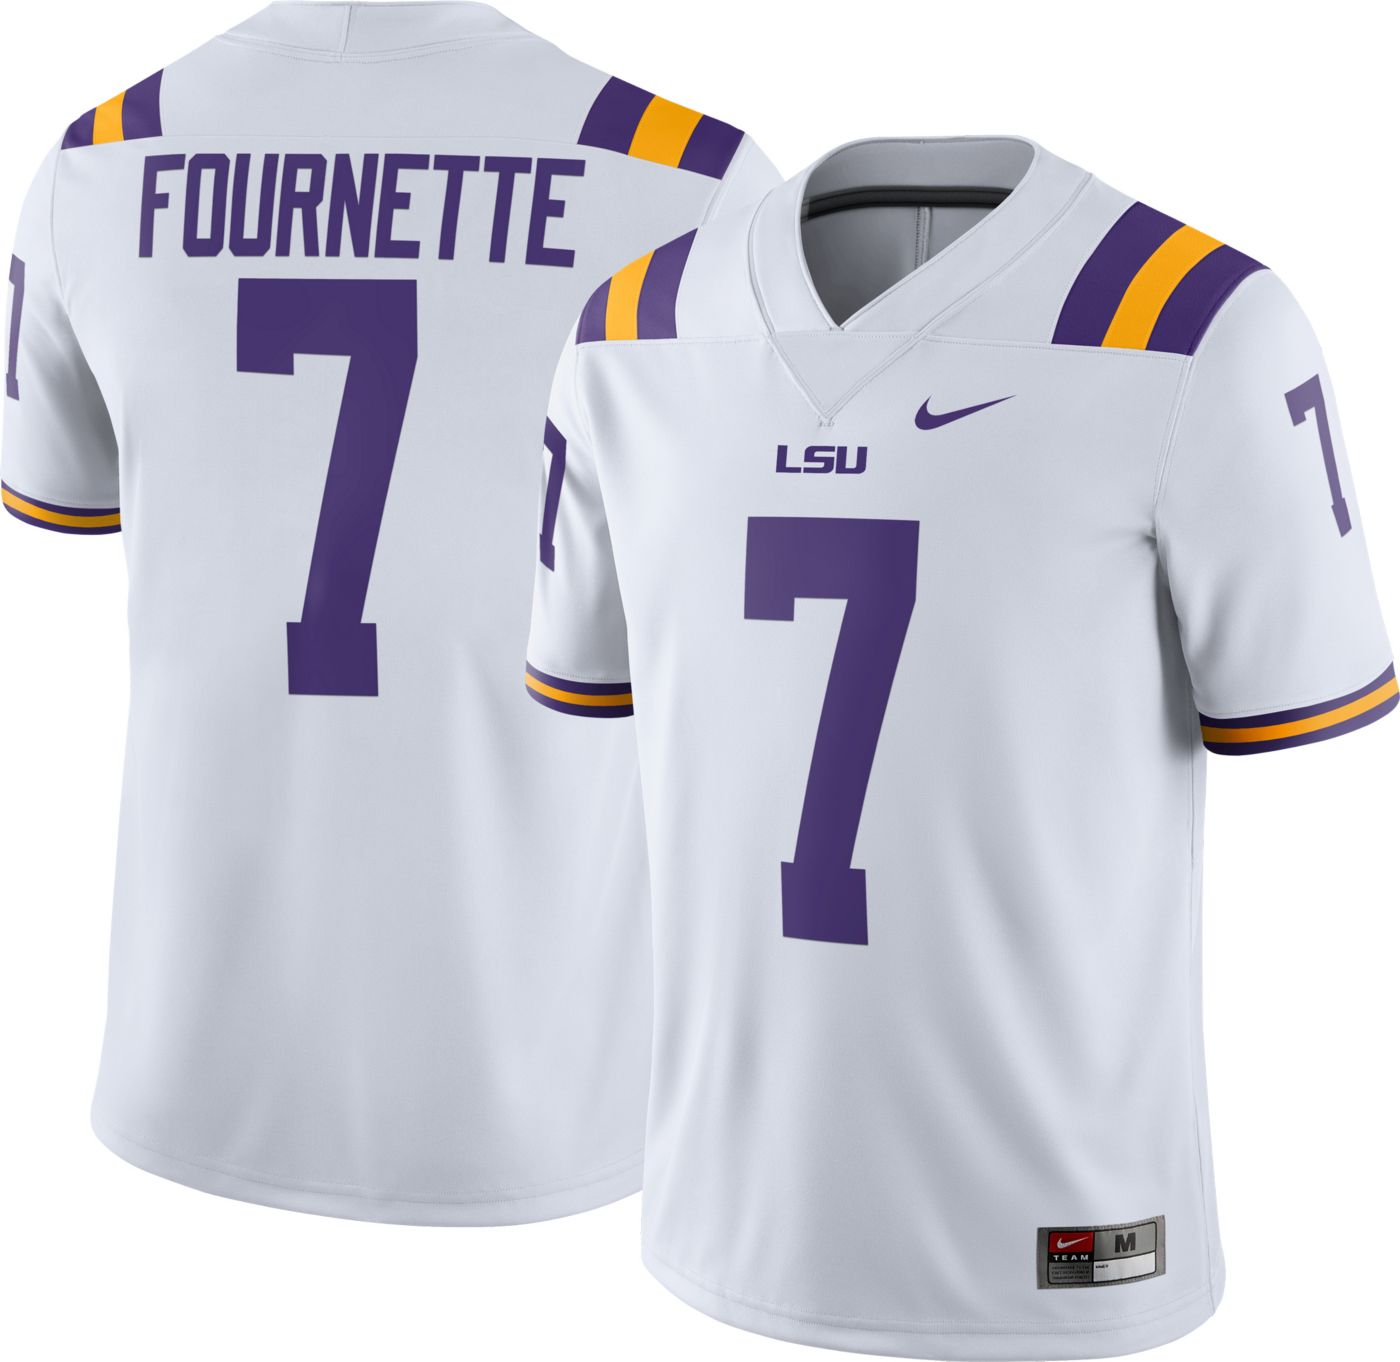 Nike Men's Leonard Fournette LSU Tigers #7 Dri-FIT Game Football White Jersey